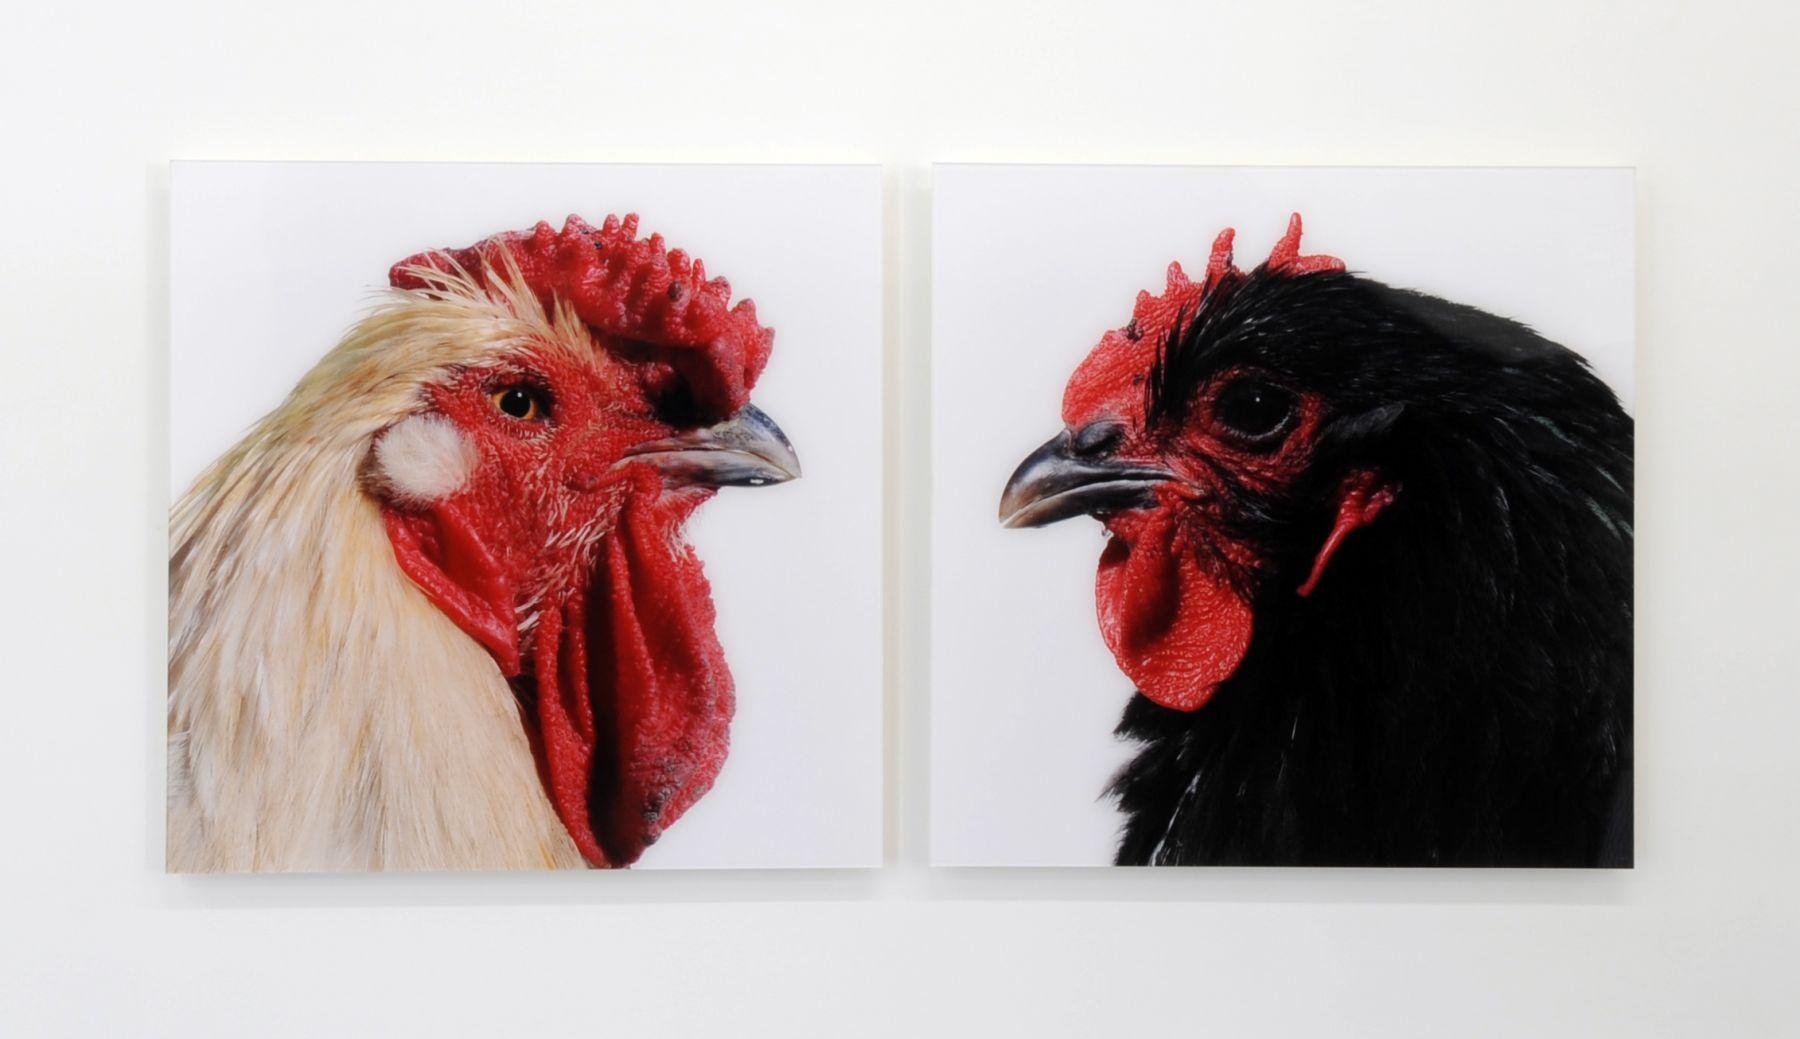 KOEN VANMECHELEN Mechelse Redcap X Jersey Giant (Cosmopolitan Chicken Project) 2007, lambdaprint, 24 x 24 inches (each)